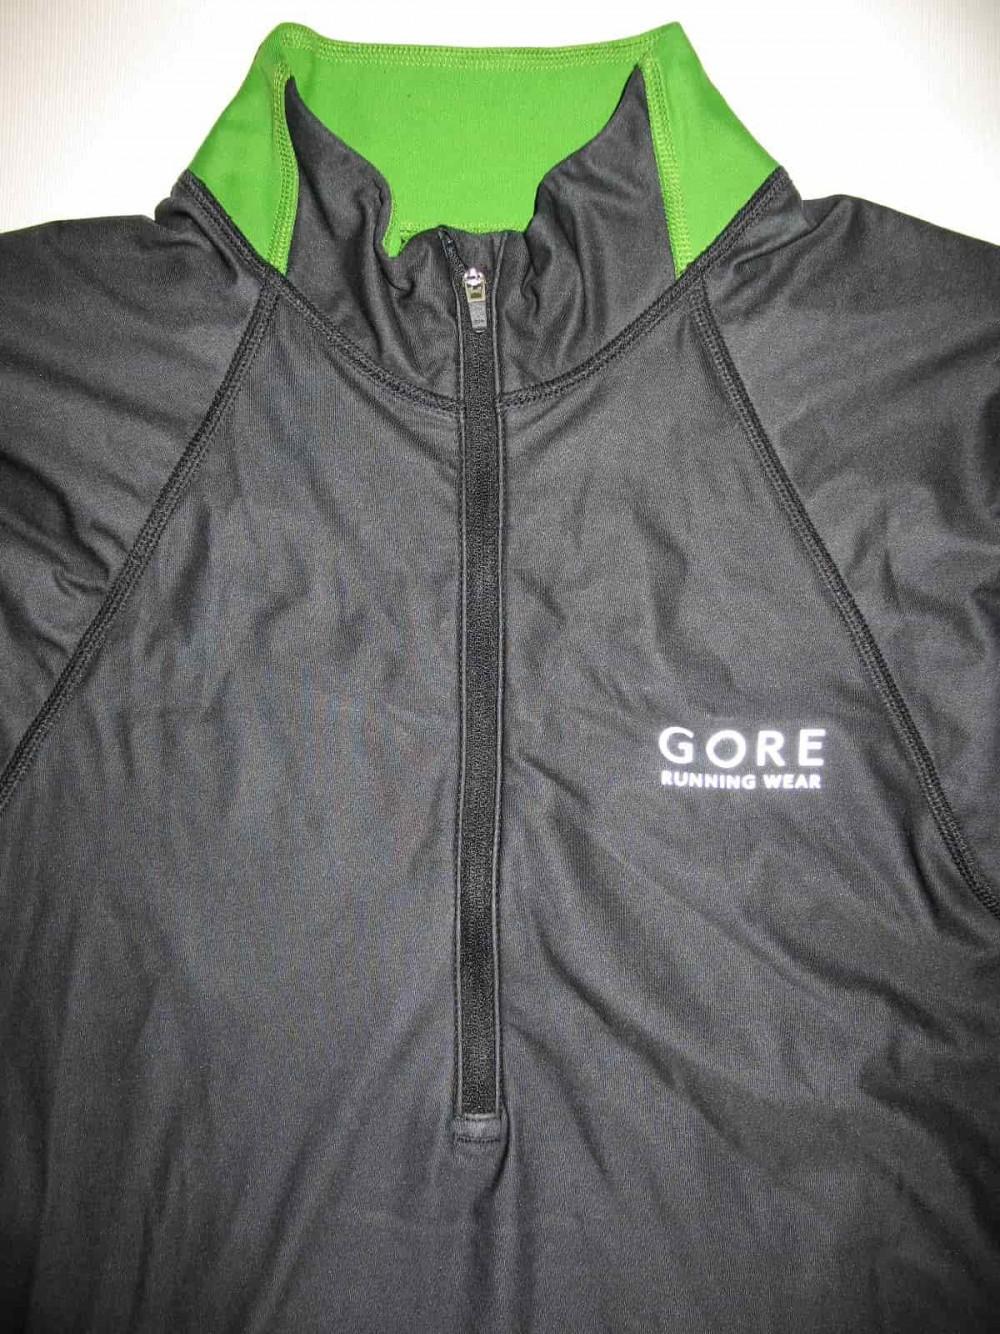 Куртка GORE running wear windstopper jersey (размер L) - 2